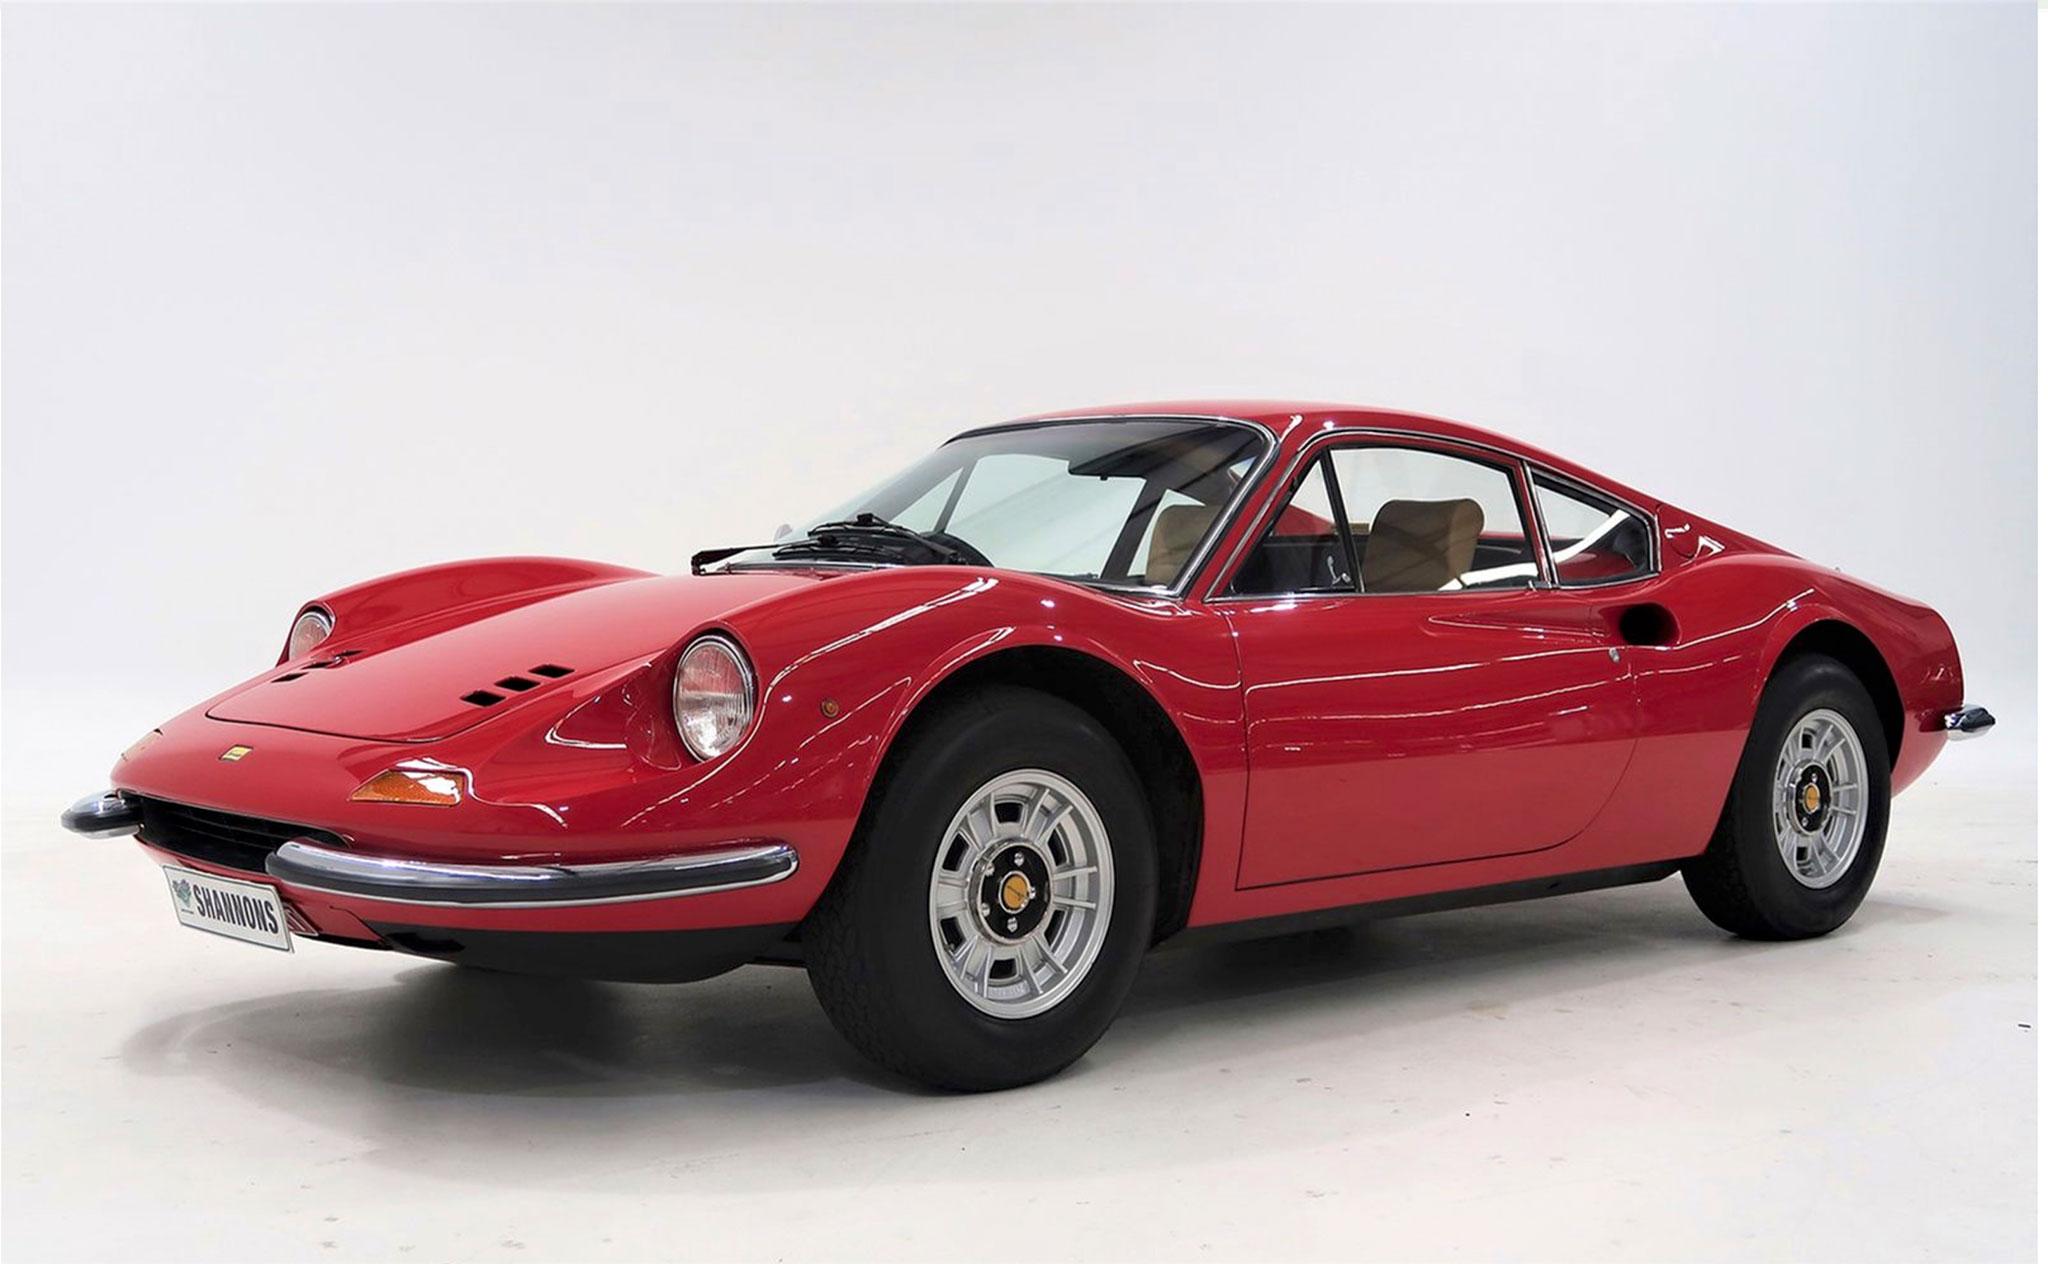 1971 Ferrari Dino 246 GT Coupé restauration minutieuse.